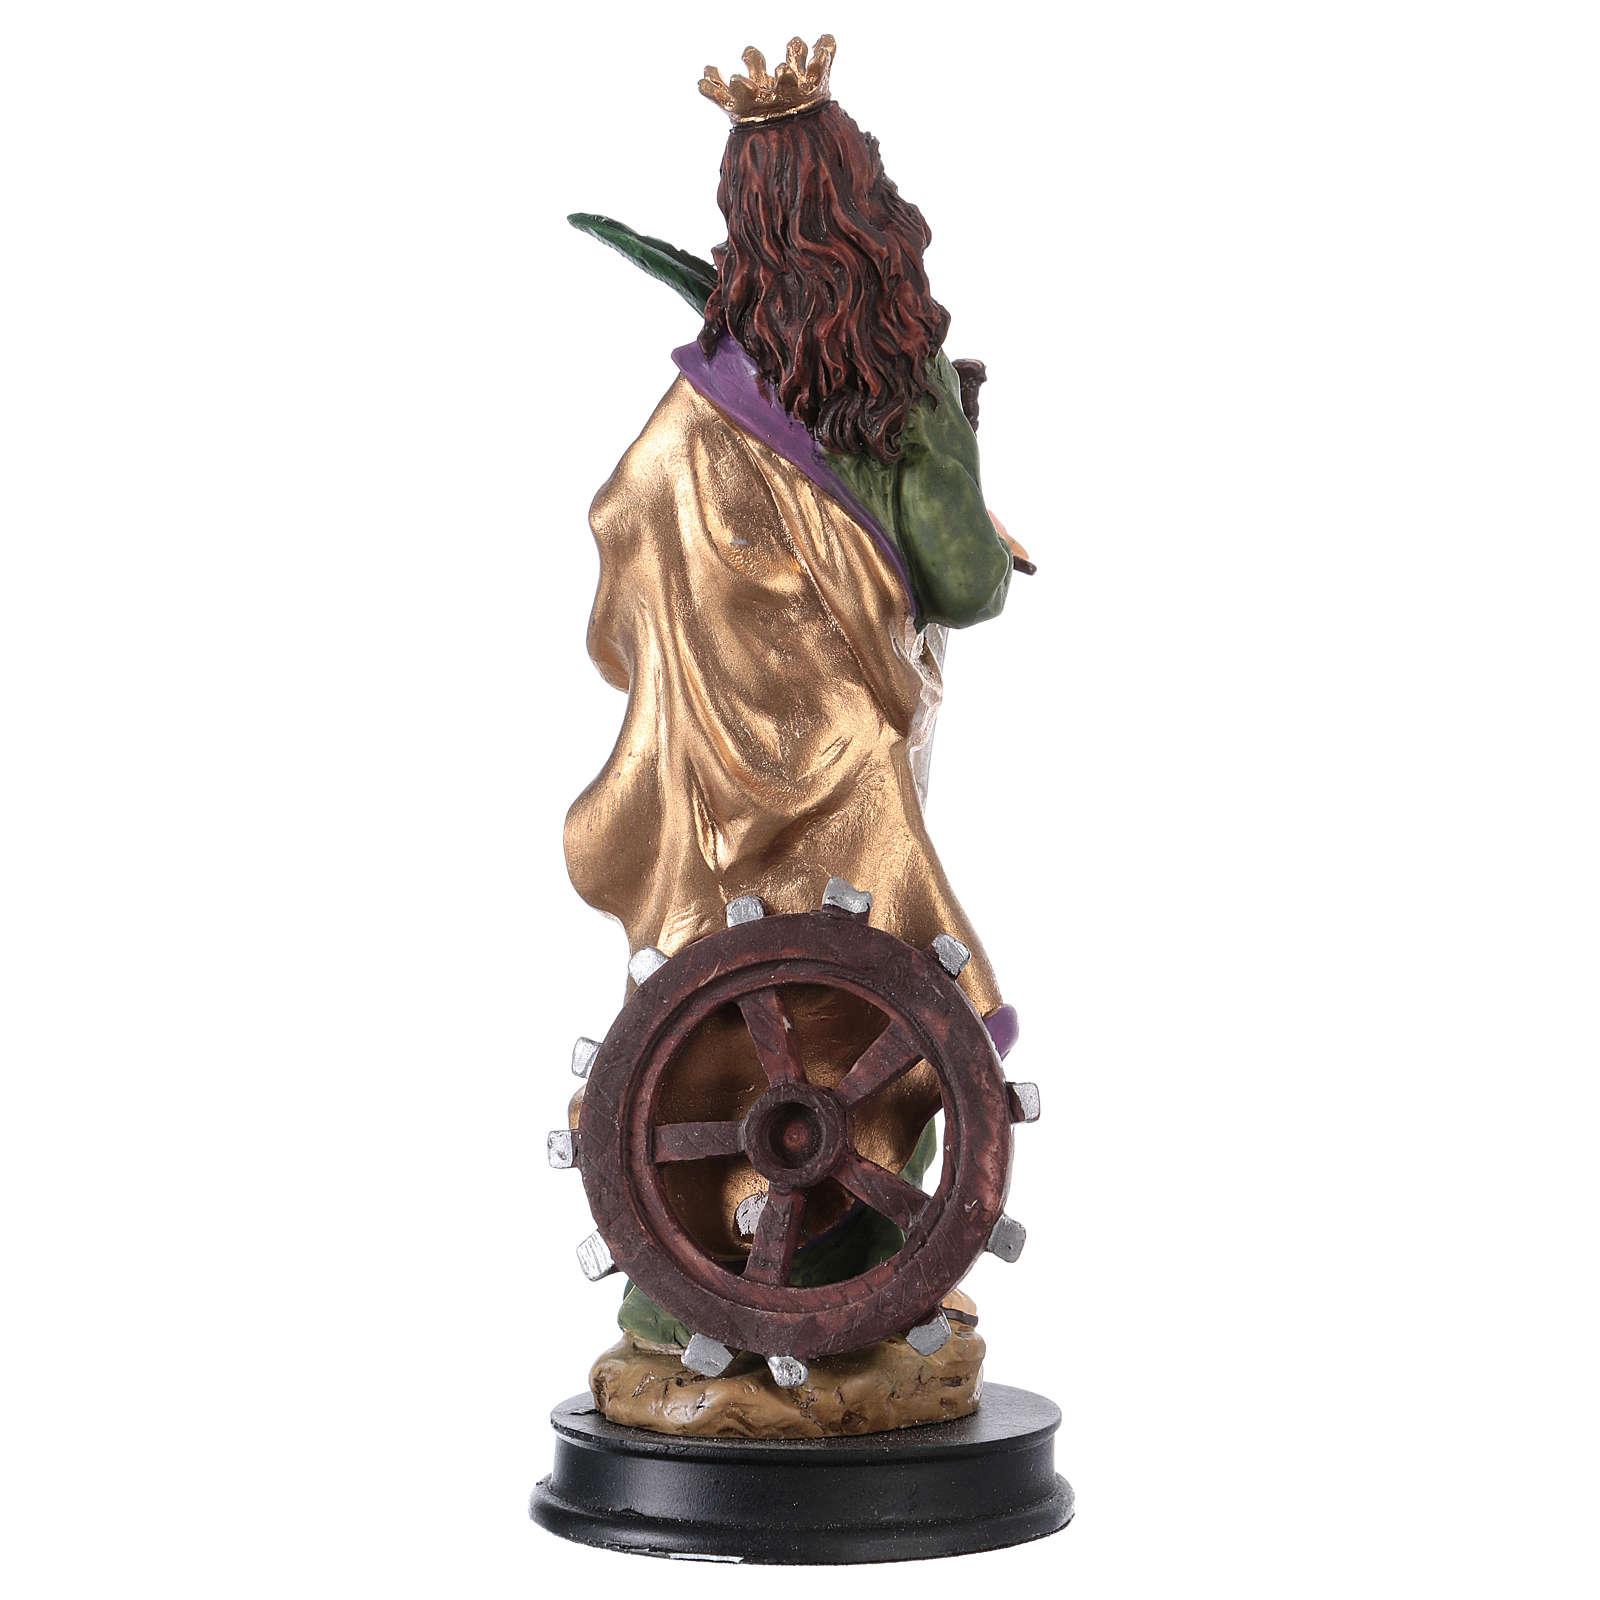 STOCK Statua resina Santa Caterina D'Alessandria 13 cm 4